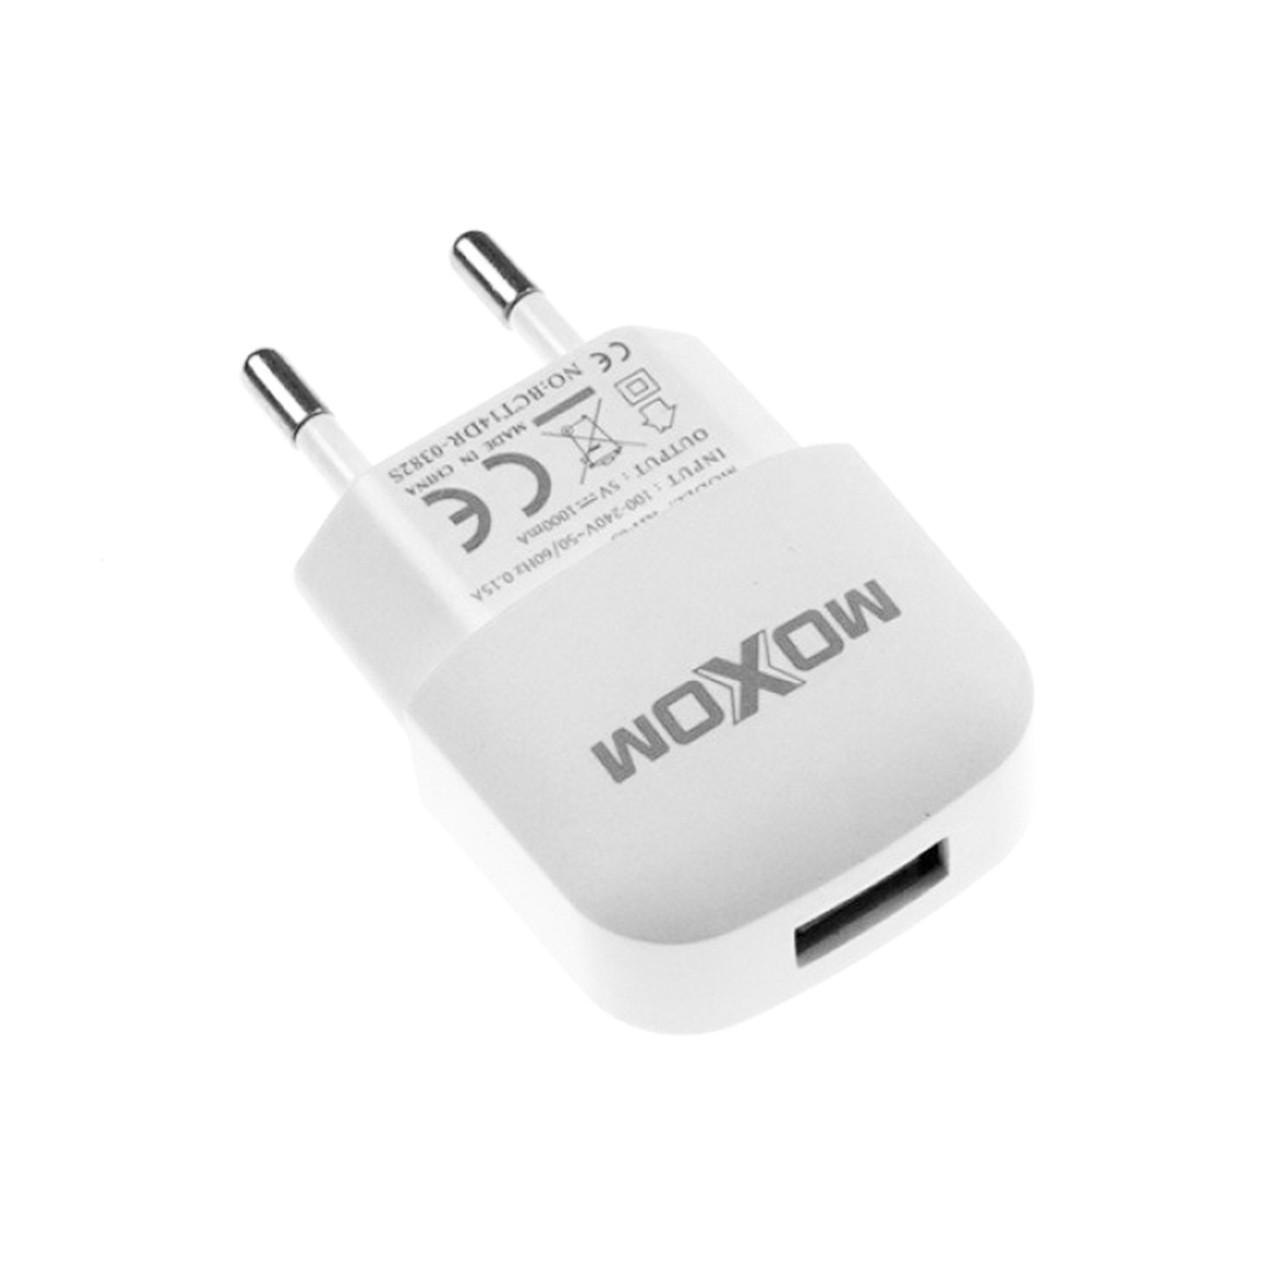 Сетевое зарядное устройство Moxom KH-05 с кабелем micro USB 1XUSB-1A White